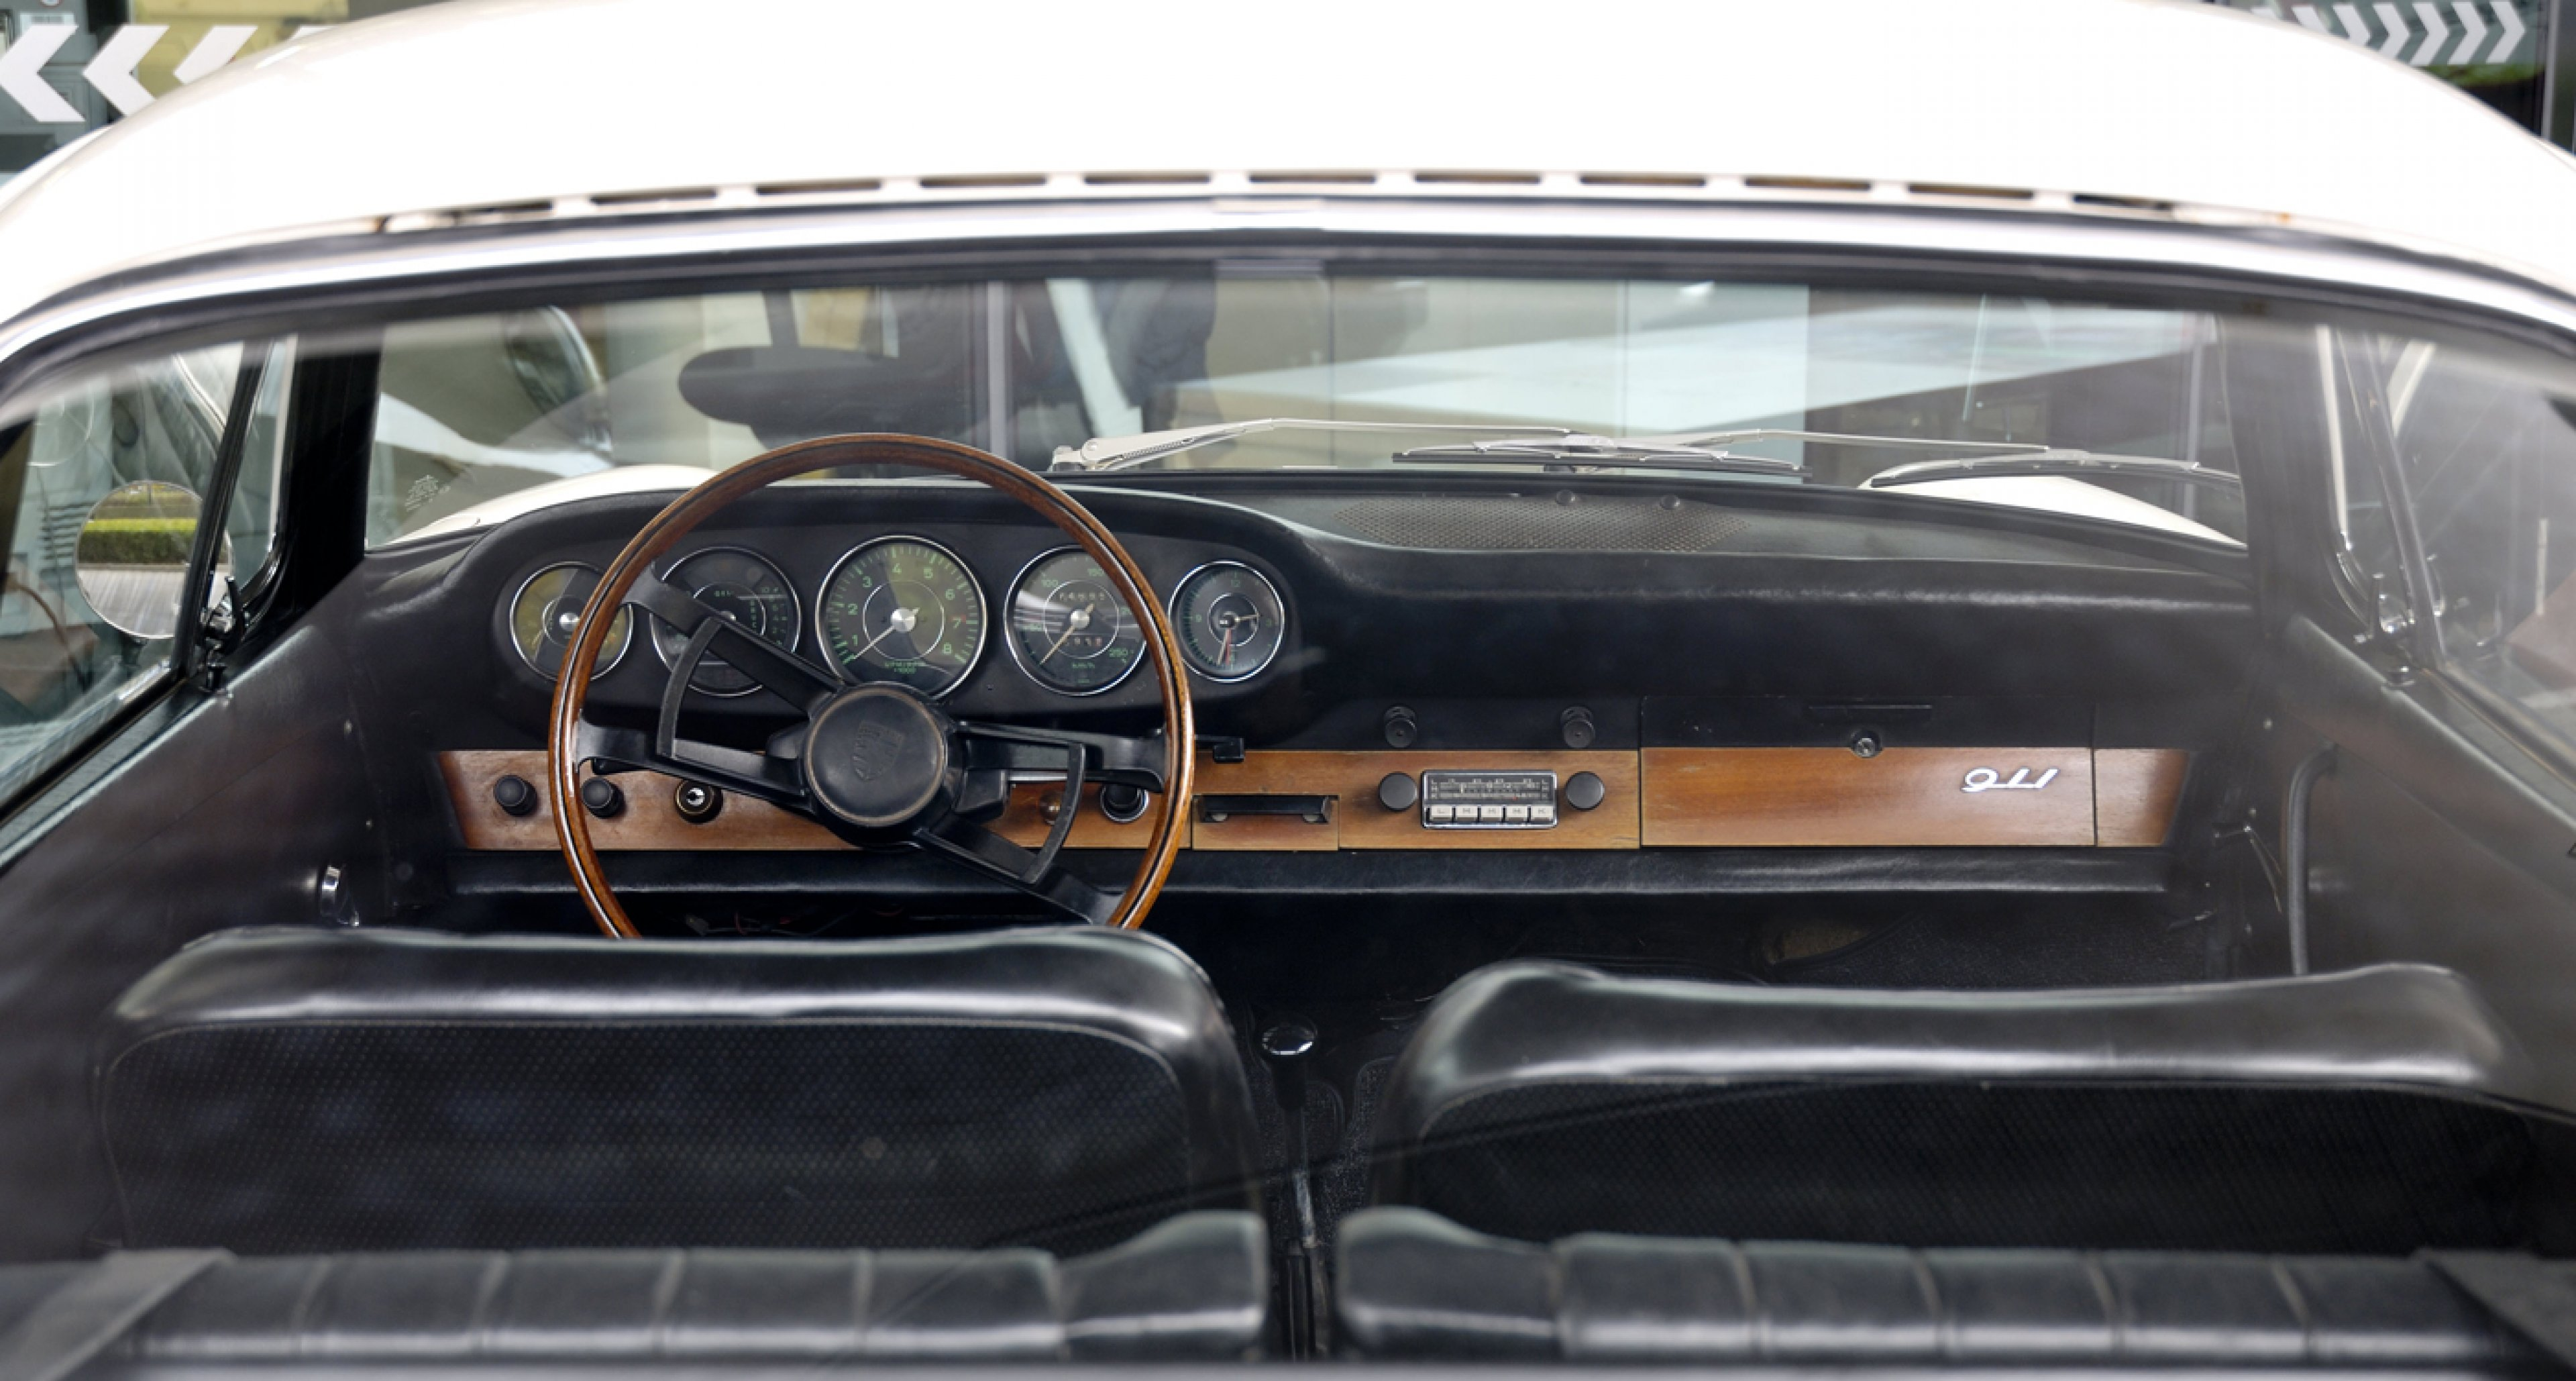 The puristic interior of a 1965 Porsche 911 2,0 Coupé.